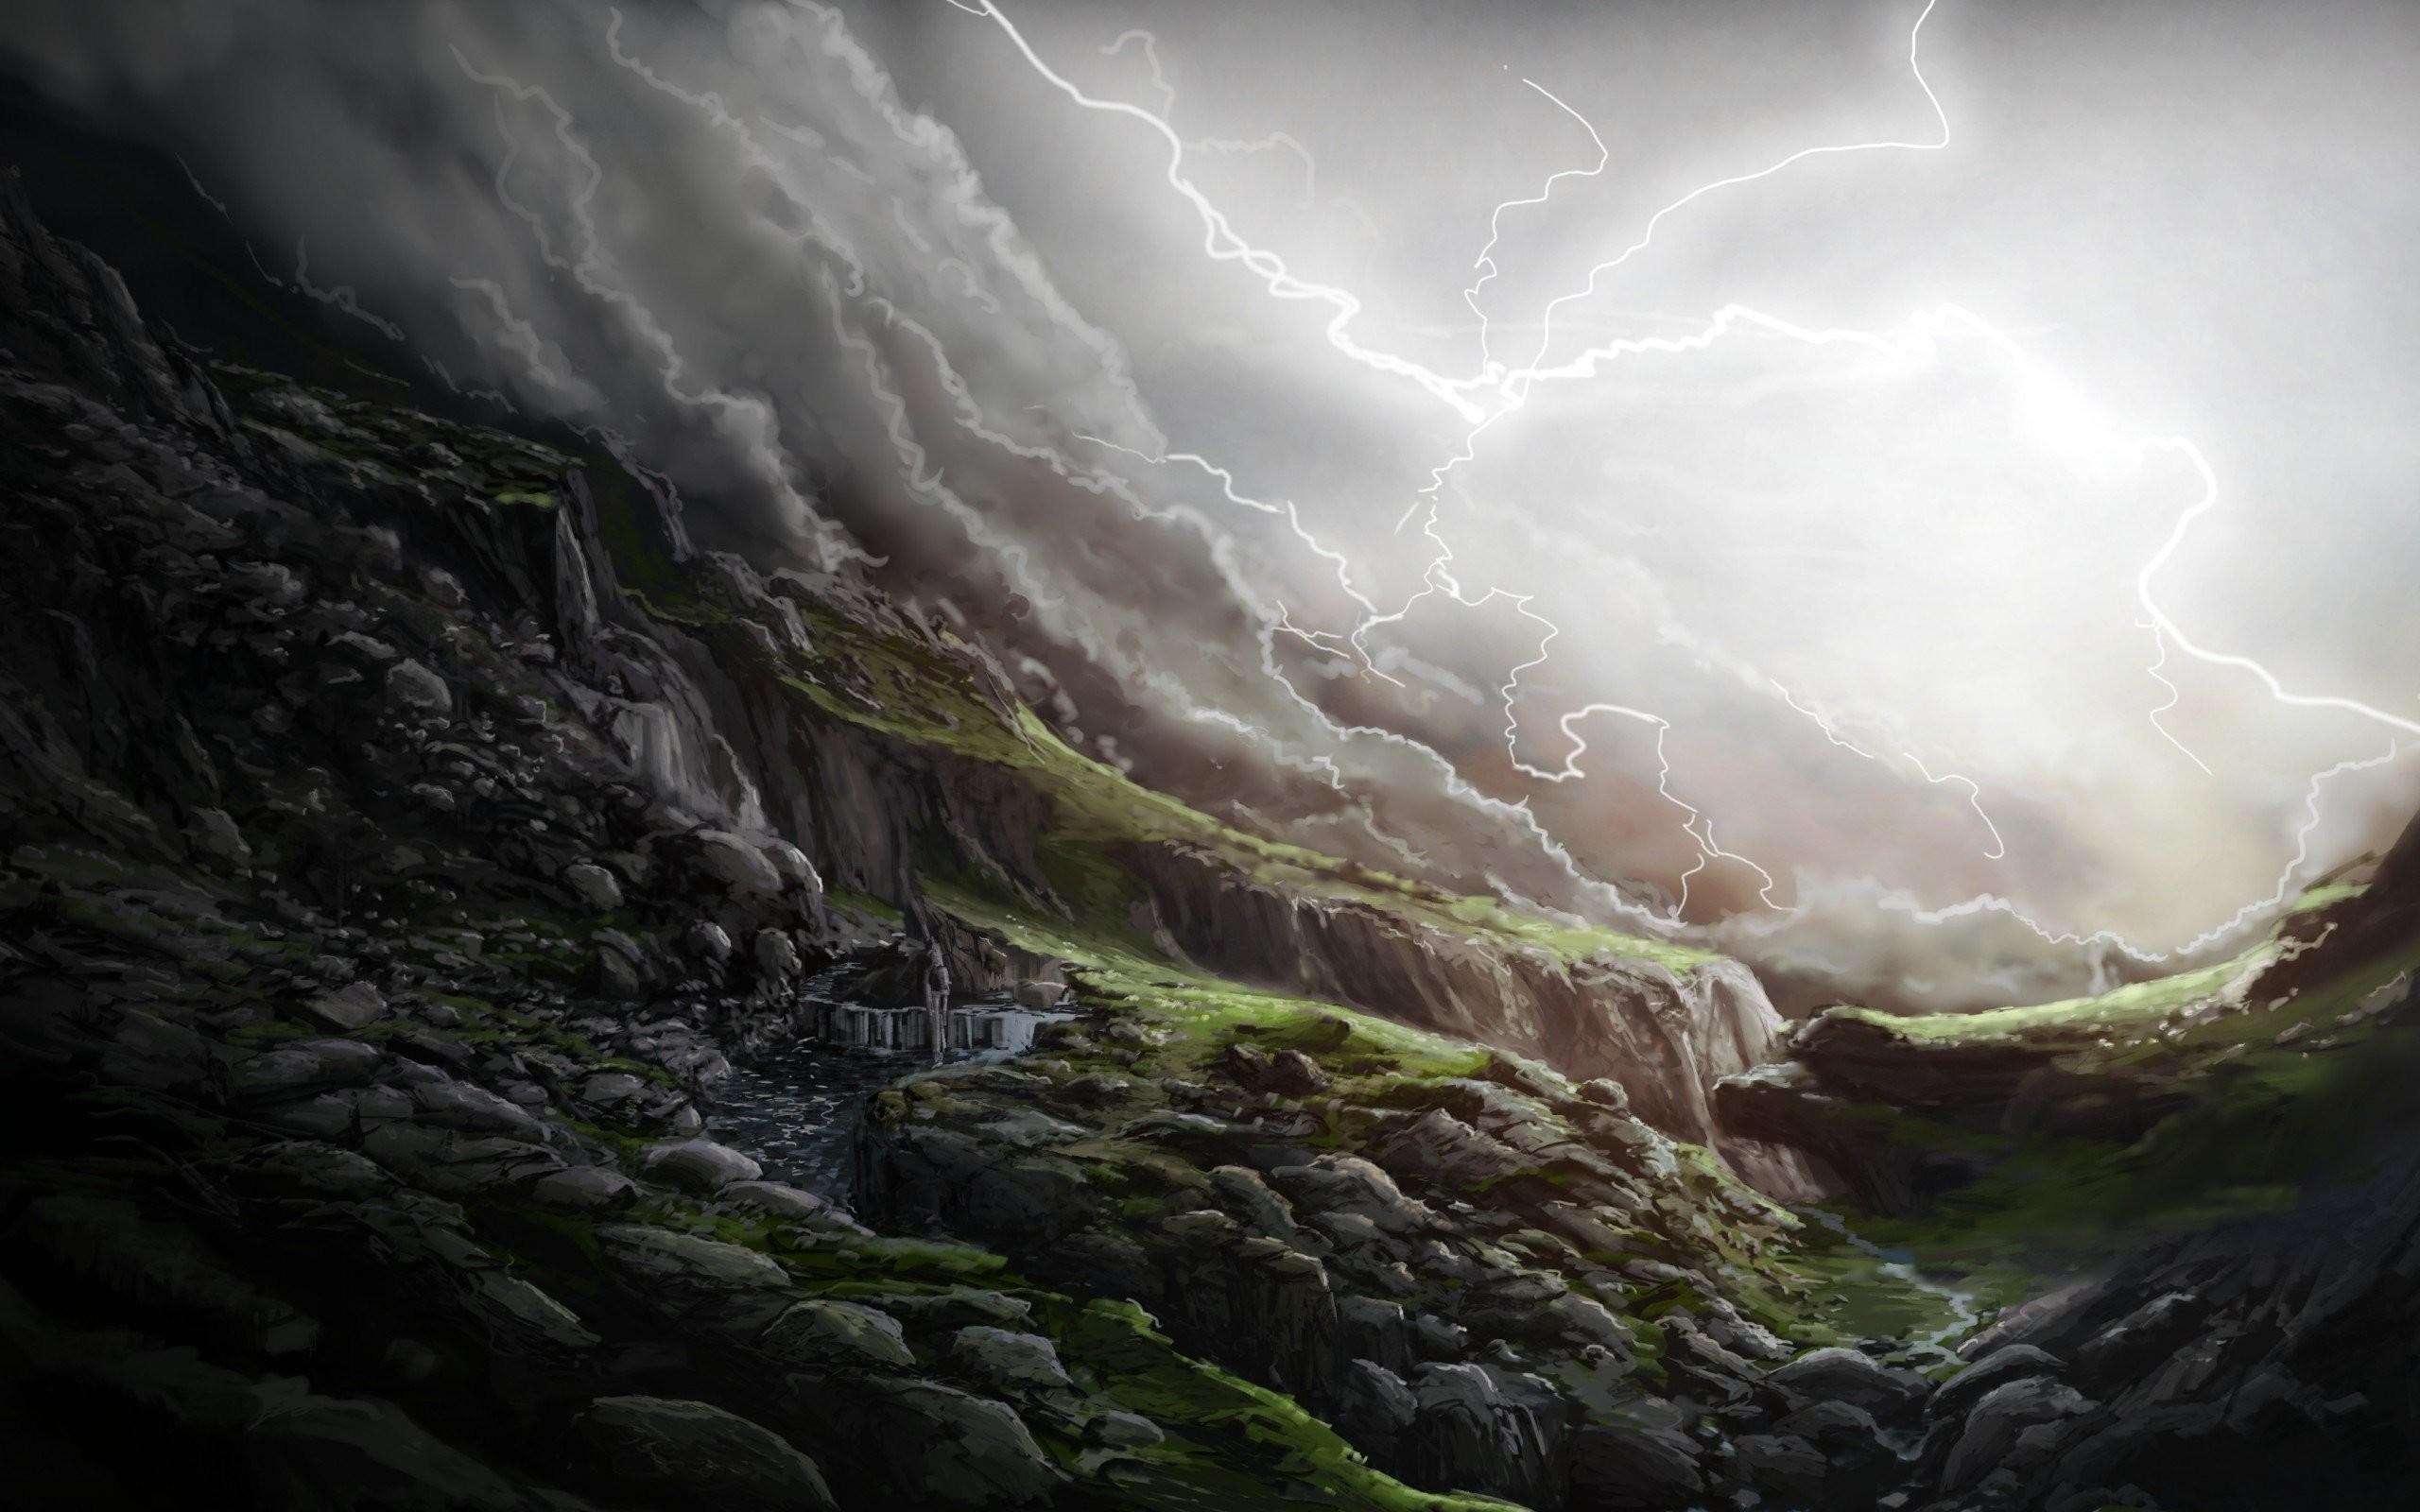 Waterfall Rain Storm Landscape Clouds Slopes Art Lightning Stones